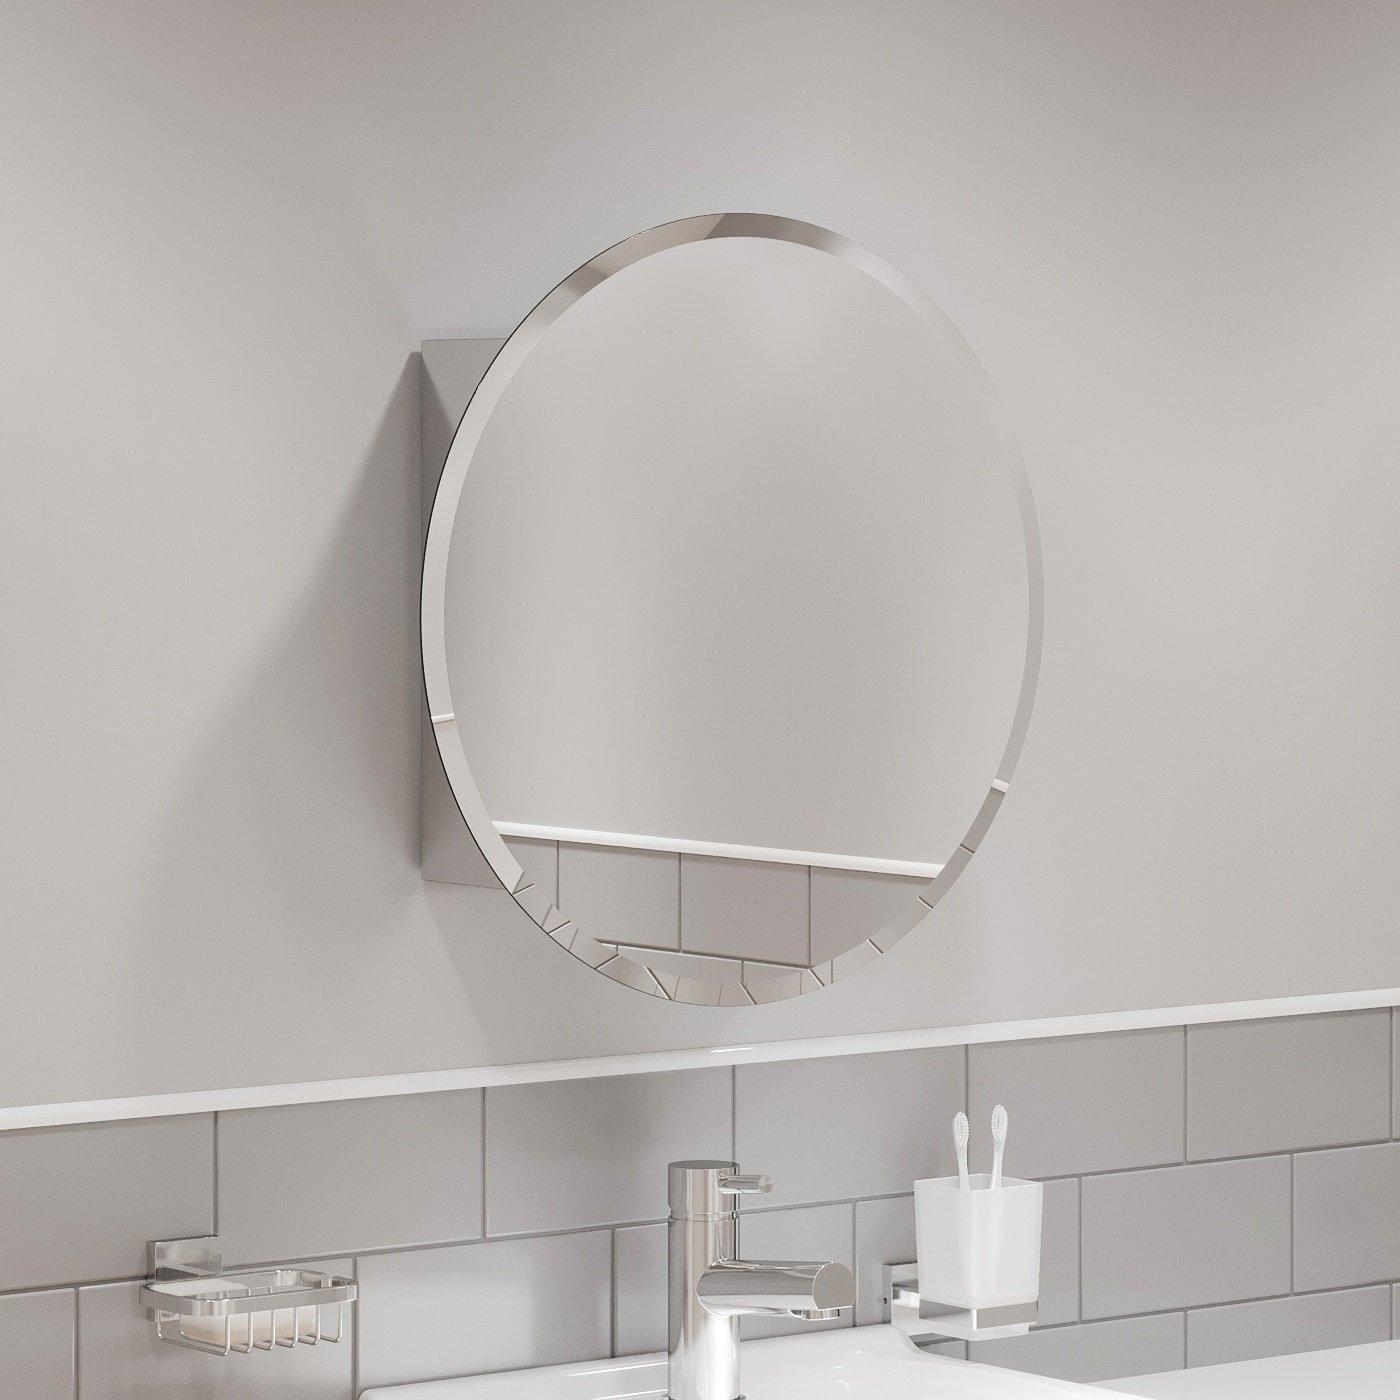 Round Door Bathroom Mirror Cabinet Cupboard Stainless Steel Wall Mounted 500mm Ebay